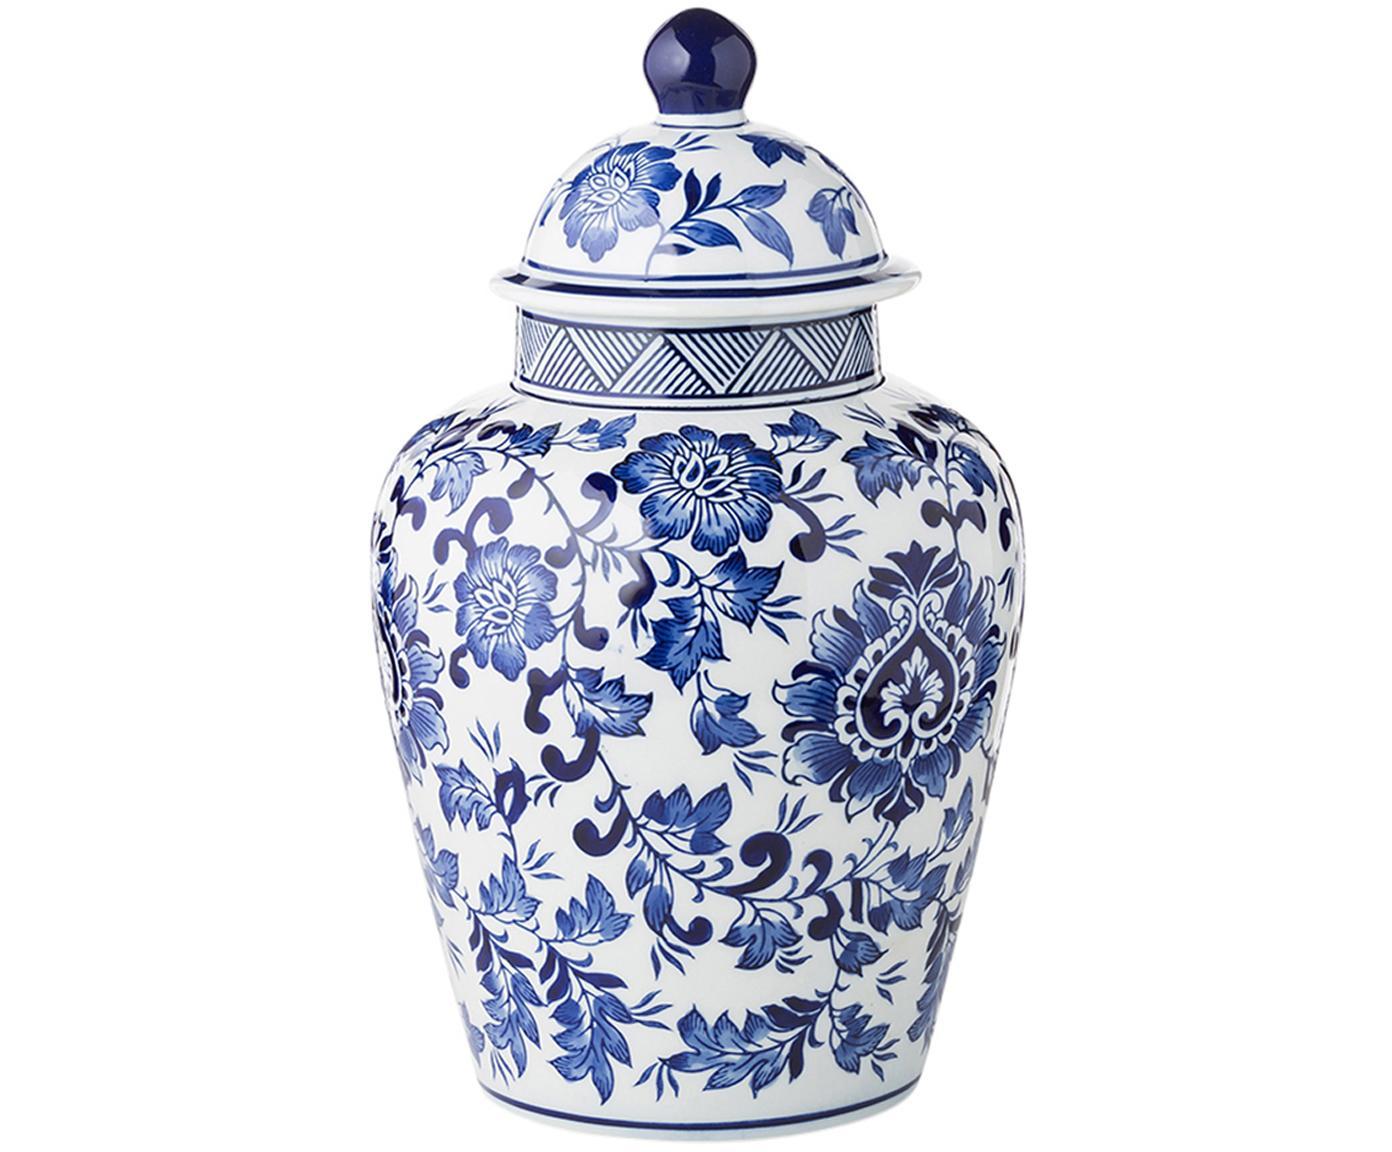 Vaas met deksel Annabelle uit porselein, Porselein, Blauw, wit, Ø 20 cm